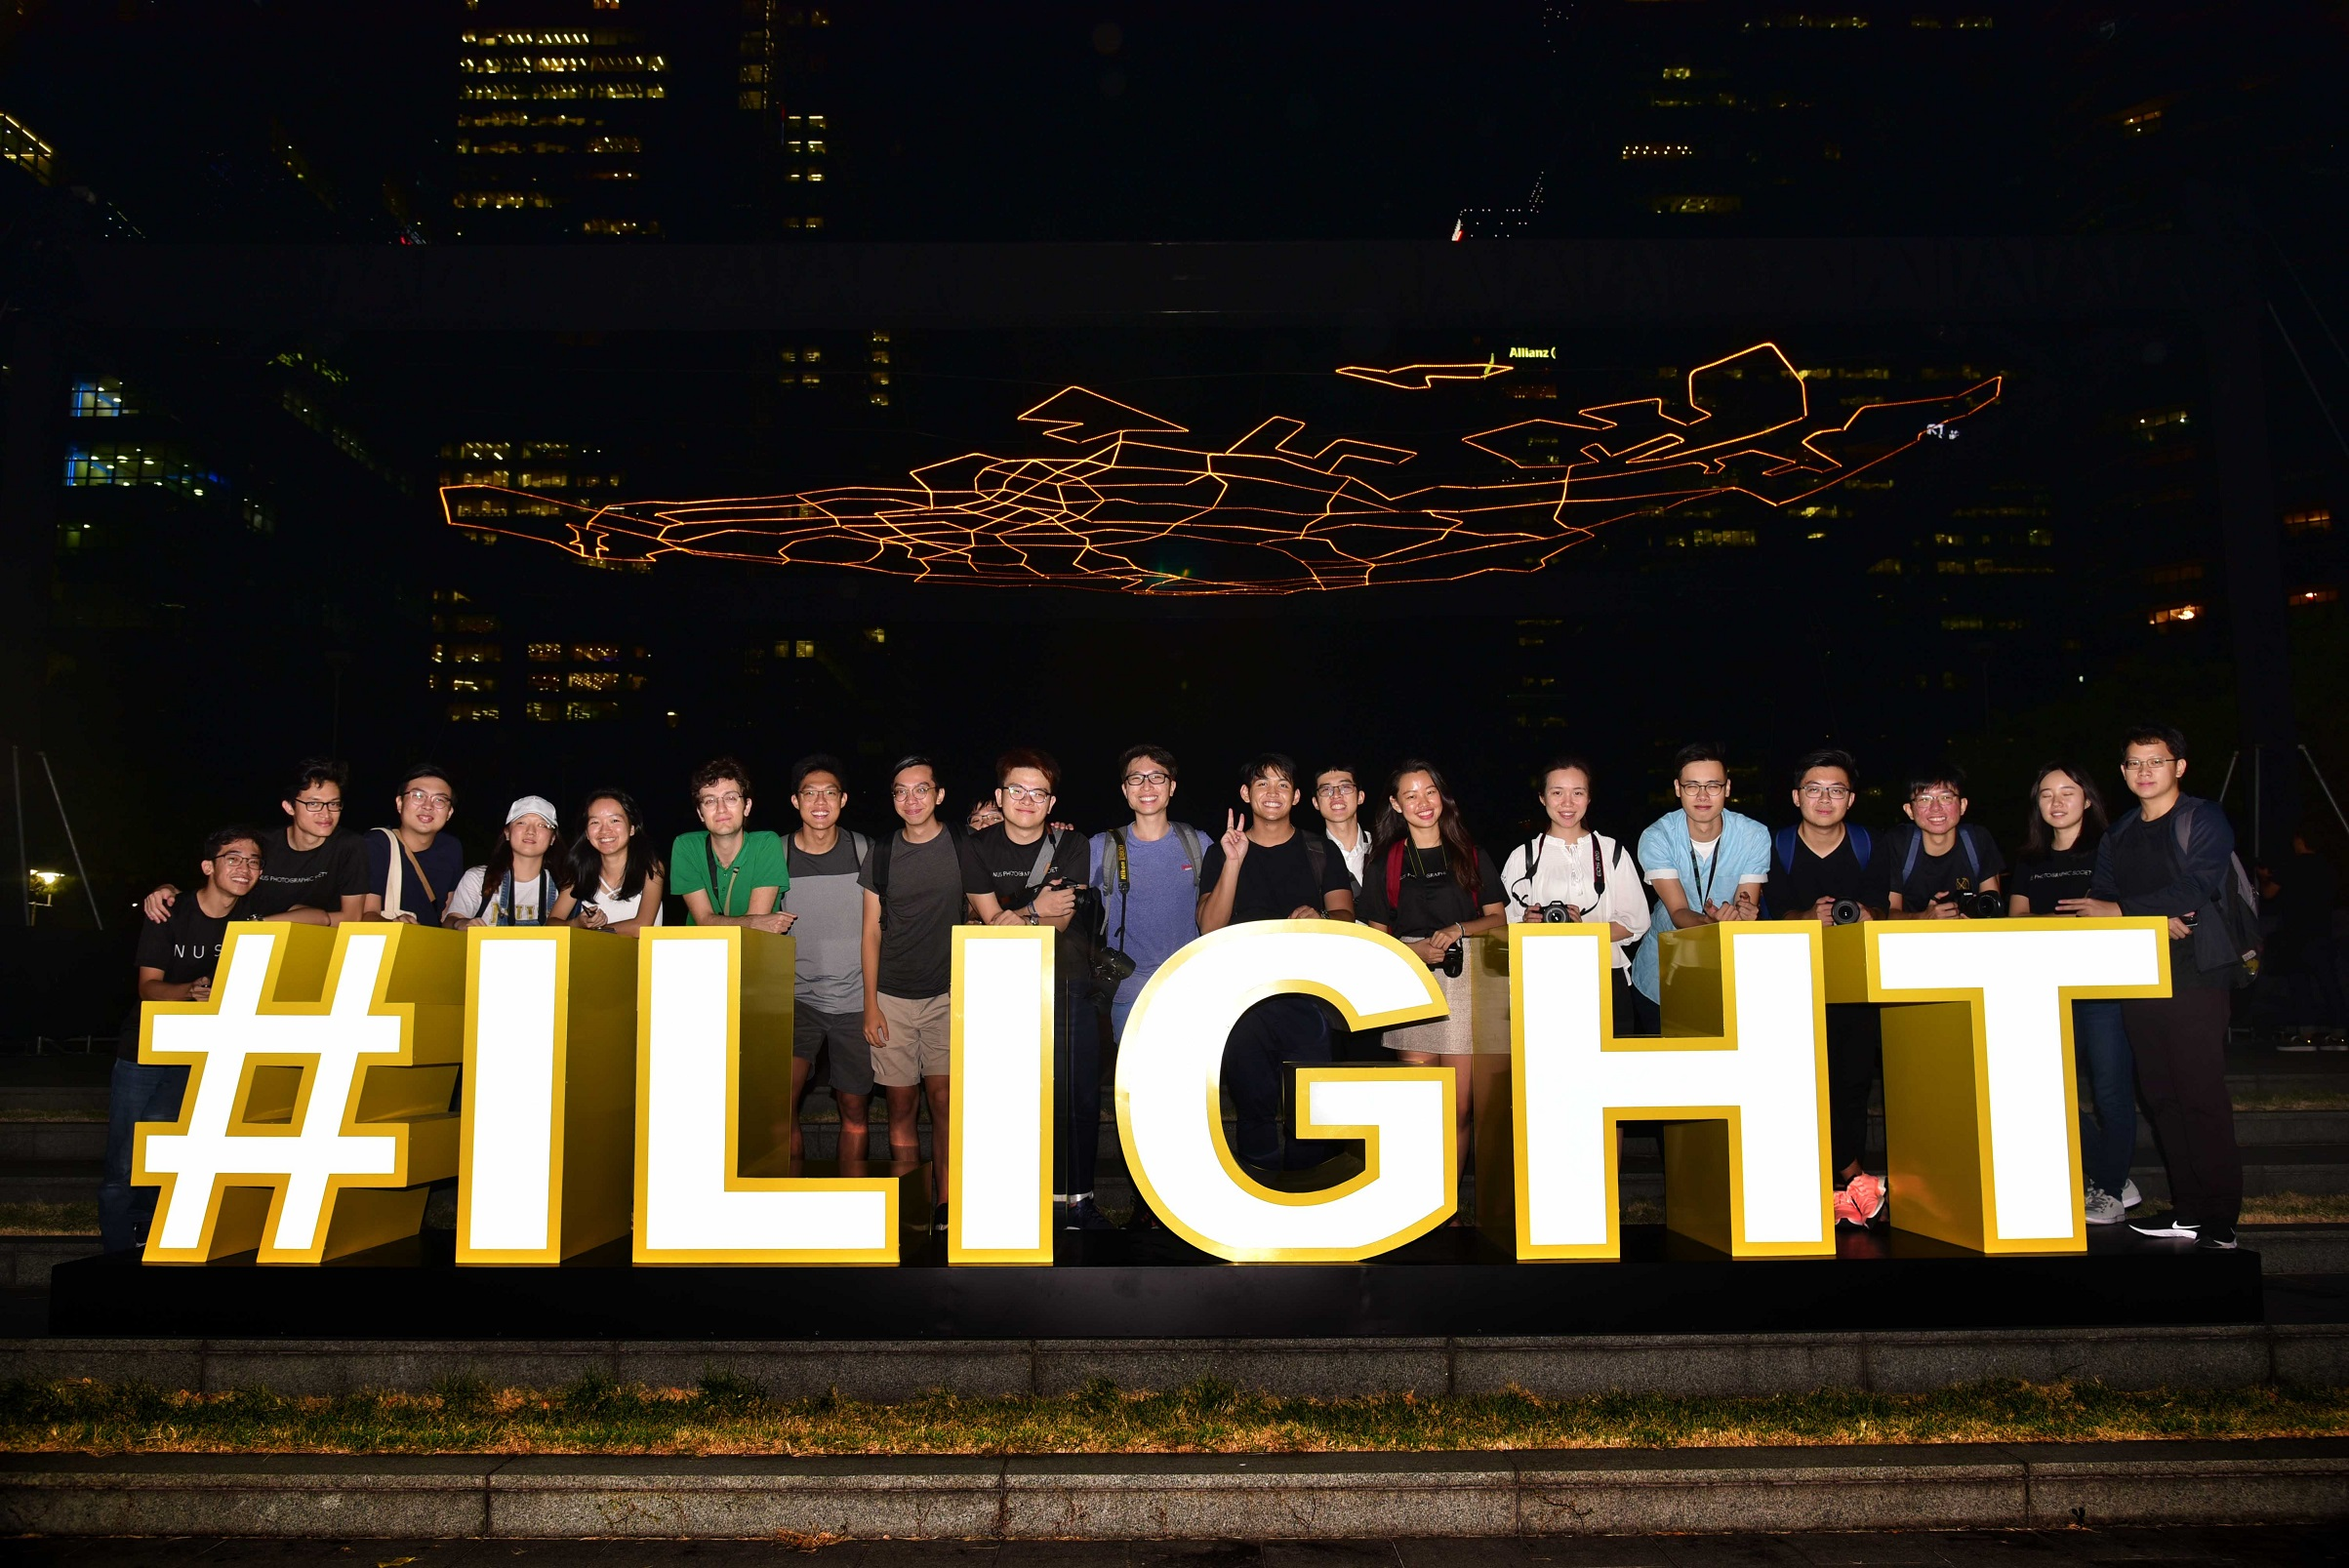 Highlights: i Light Photowalk